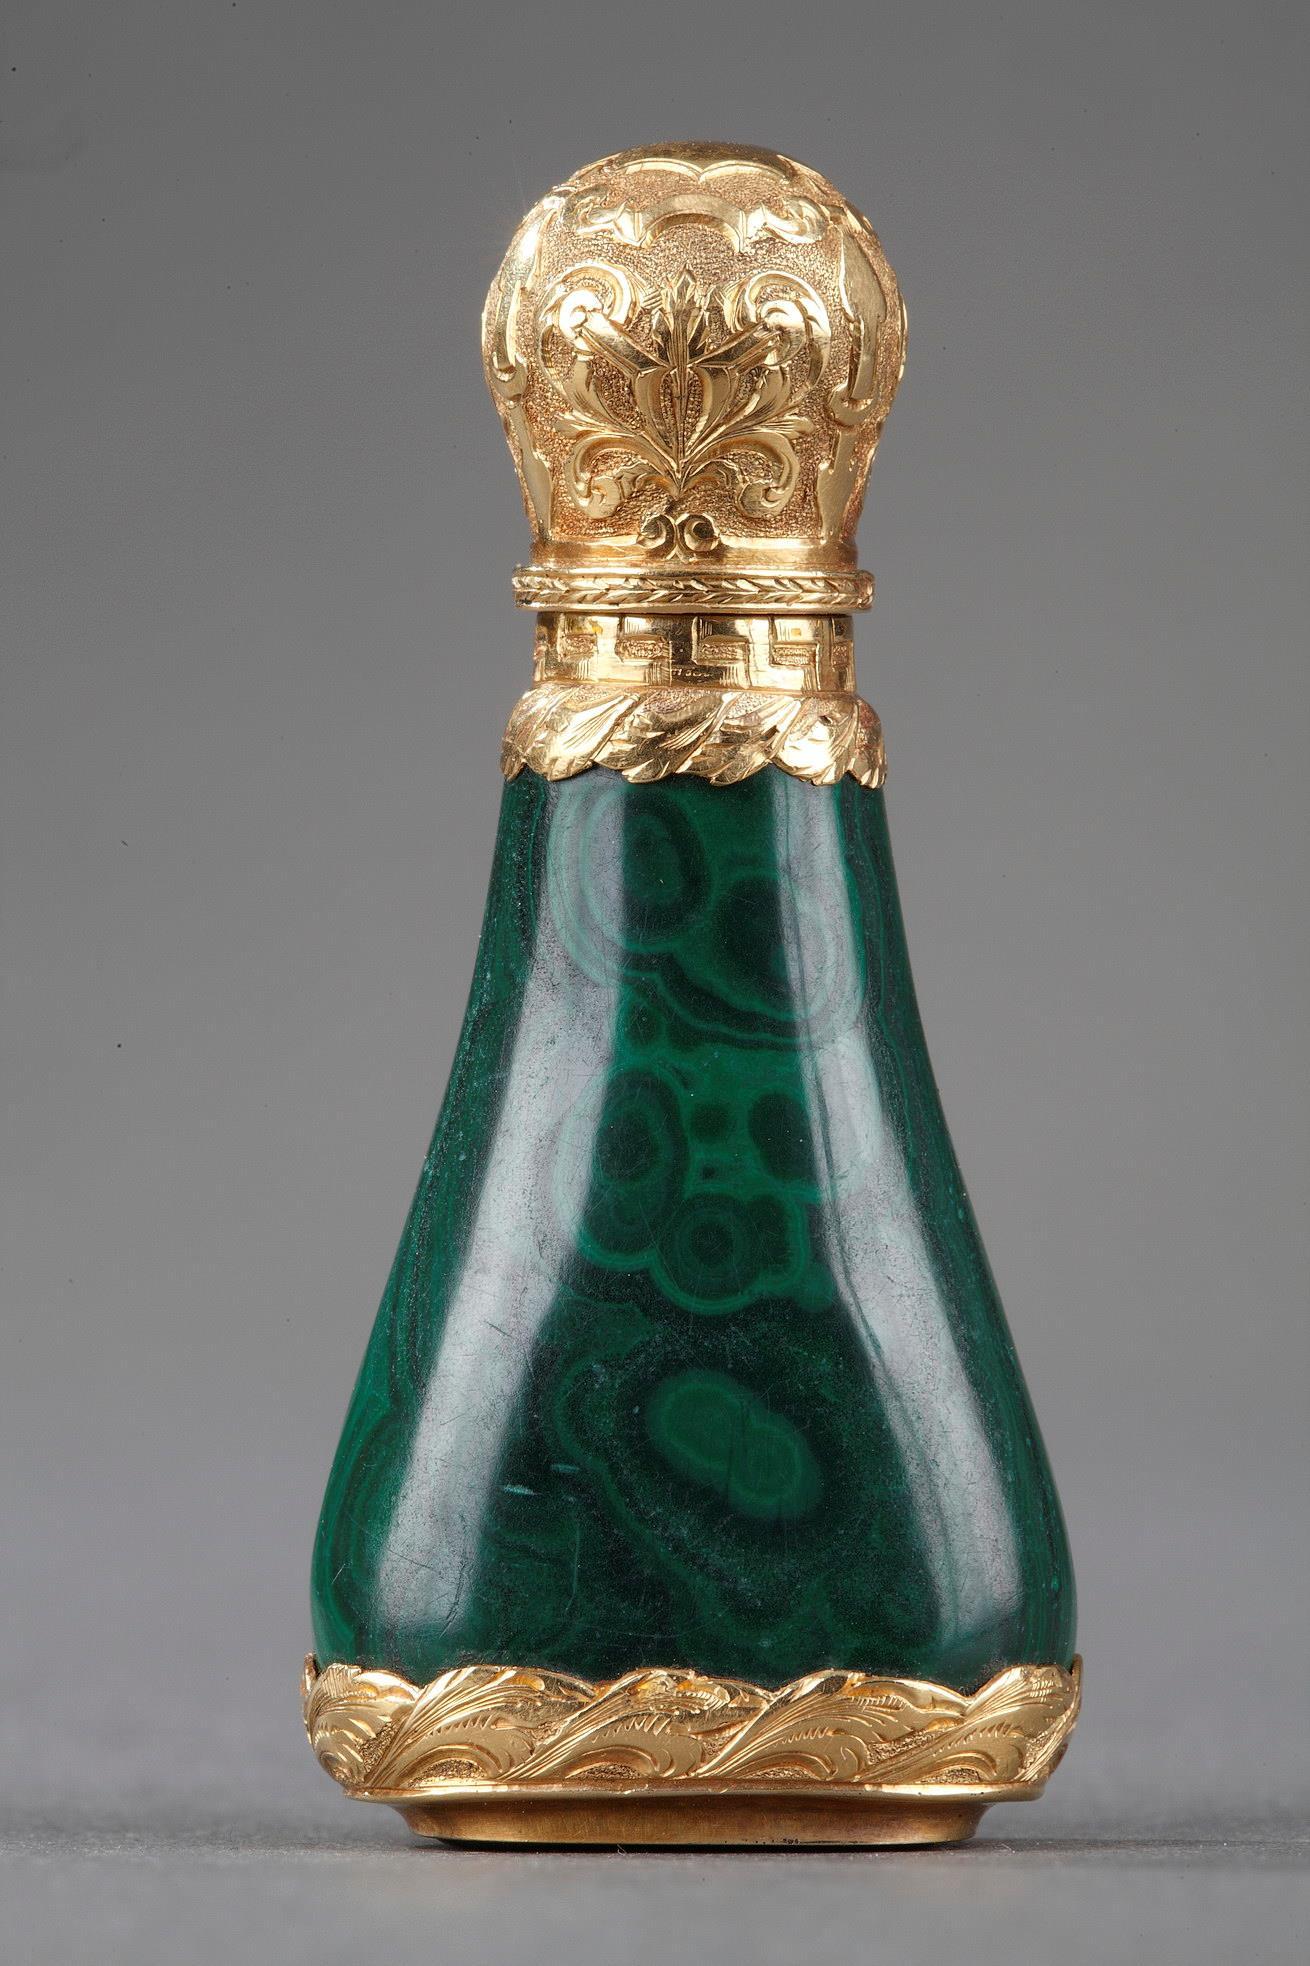 Gold mounted Malachite perfume flask. Mid-19th